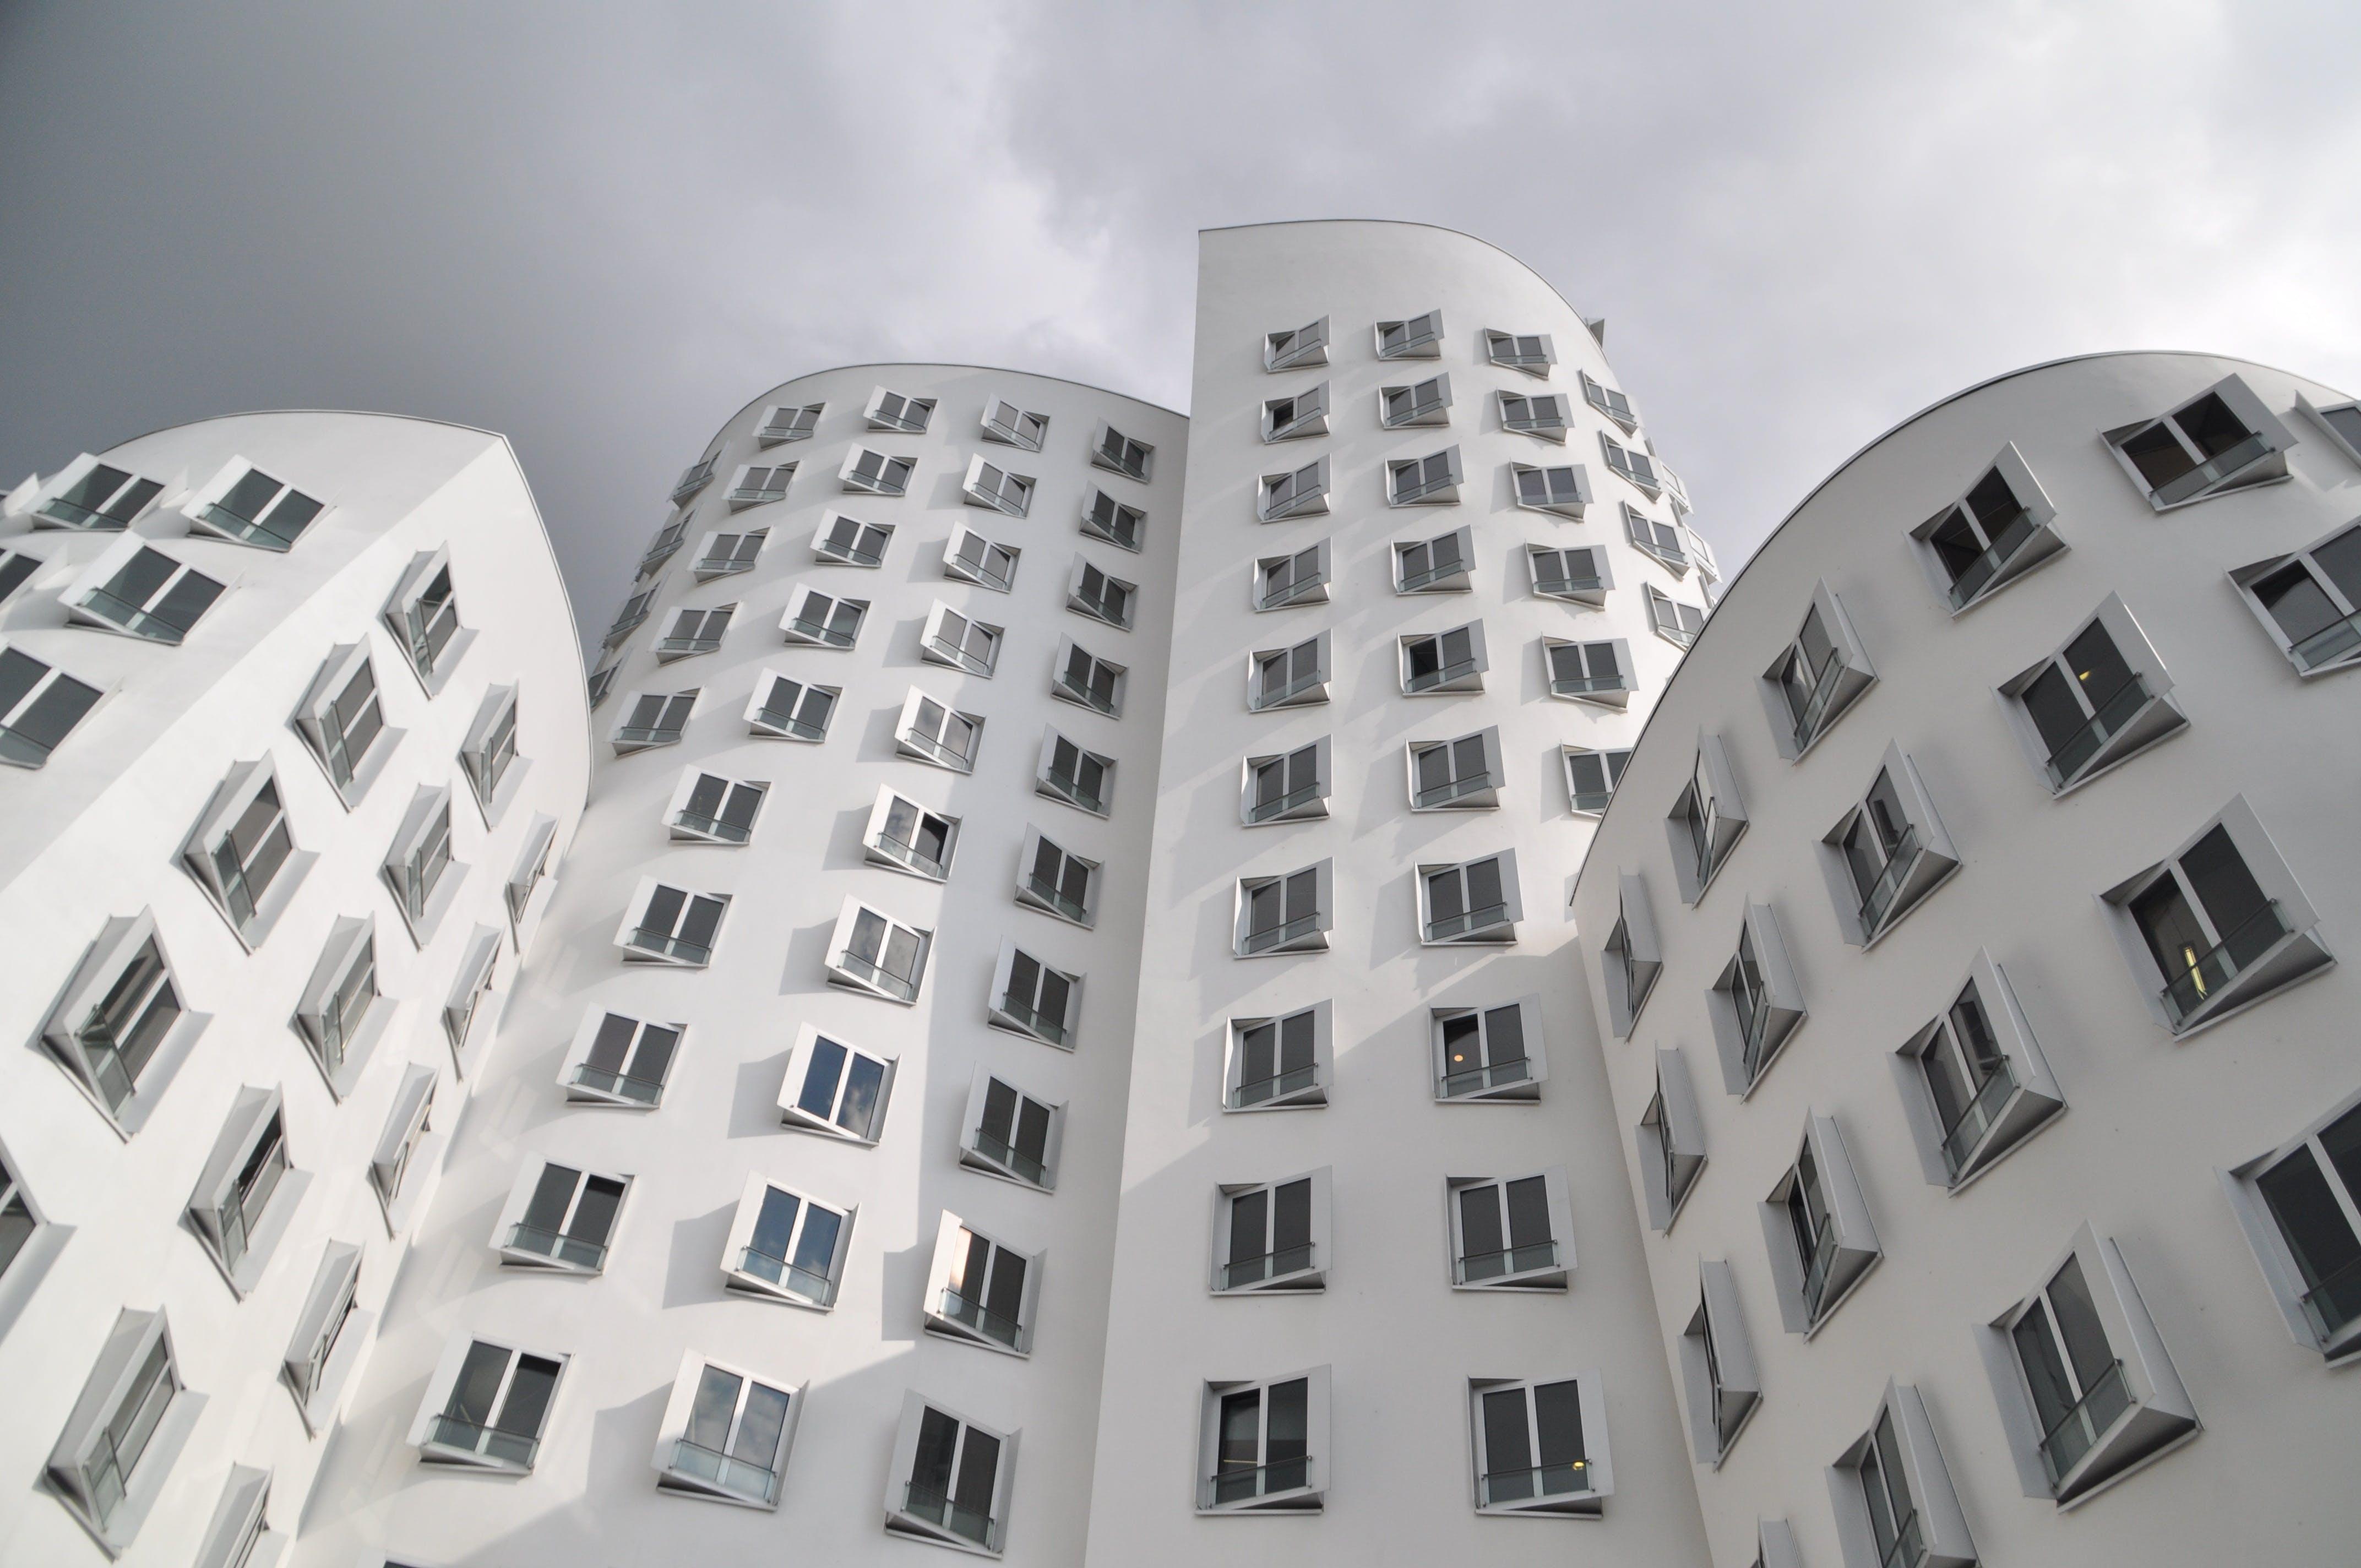 Free stock photo of architecture, modern, urban, facade